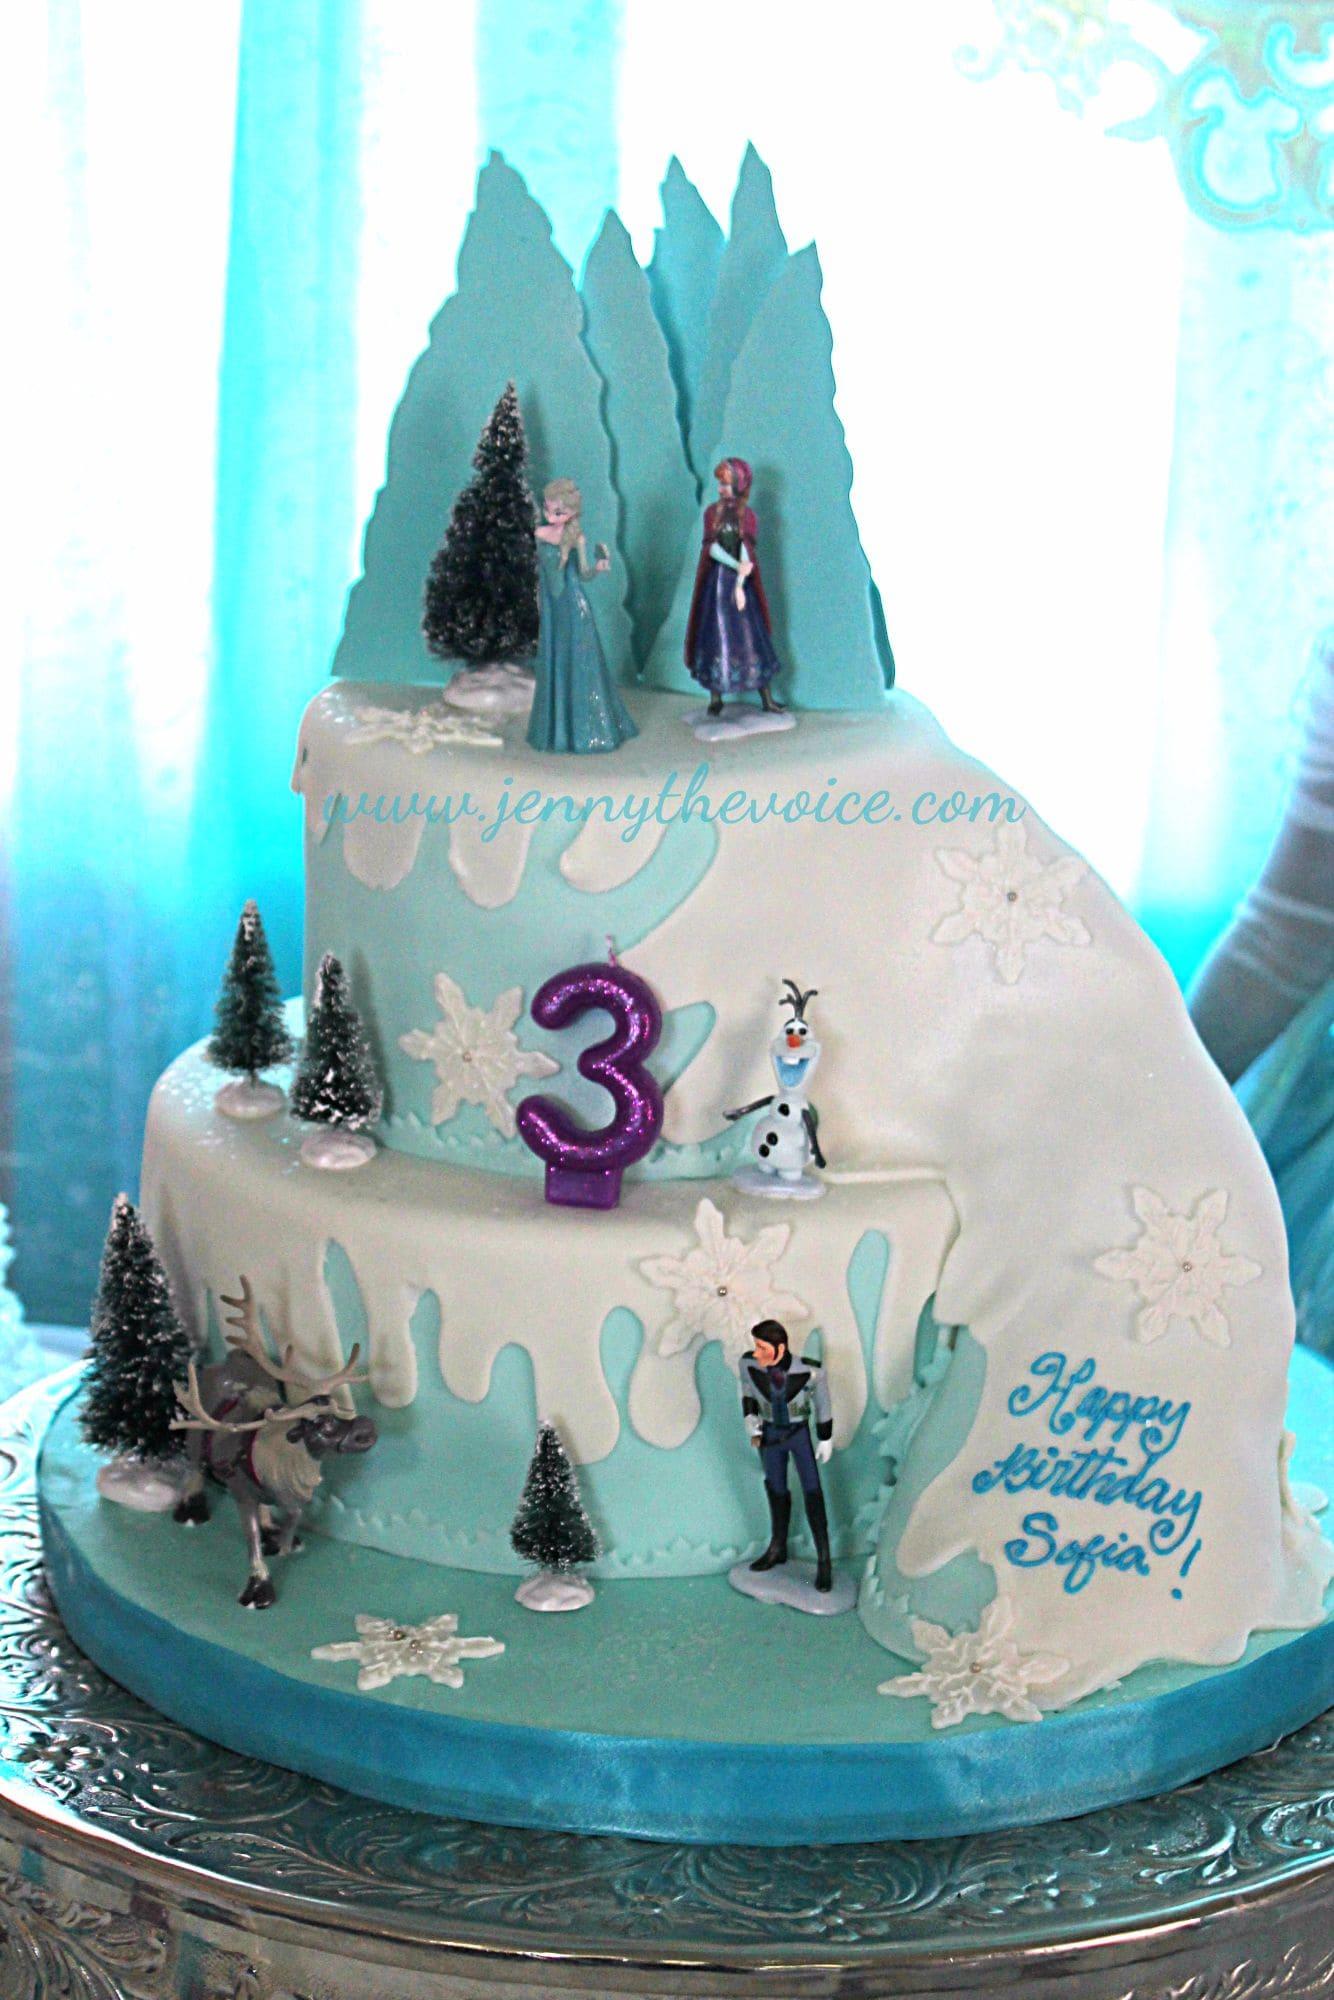 Pfp35iV - Frozen Birthday party : Sofi ya cumplió 3 años